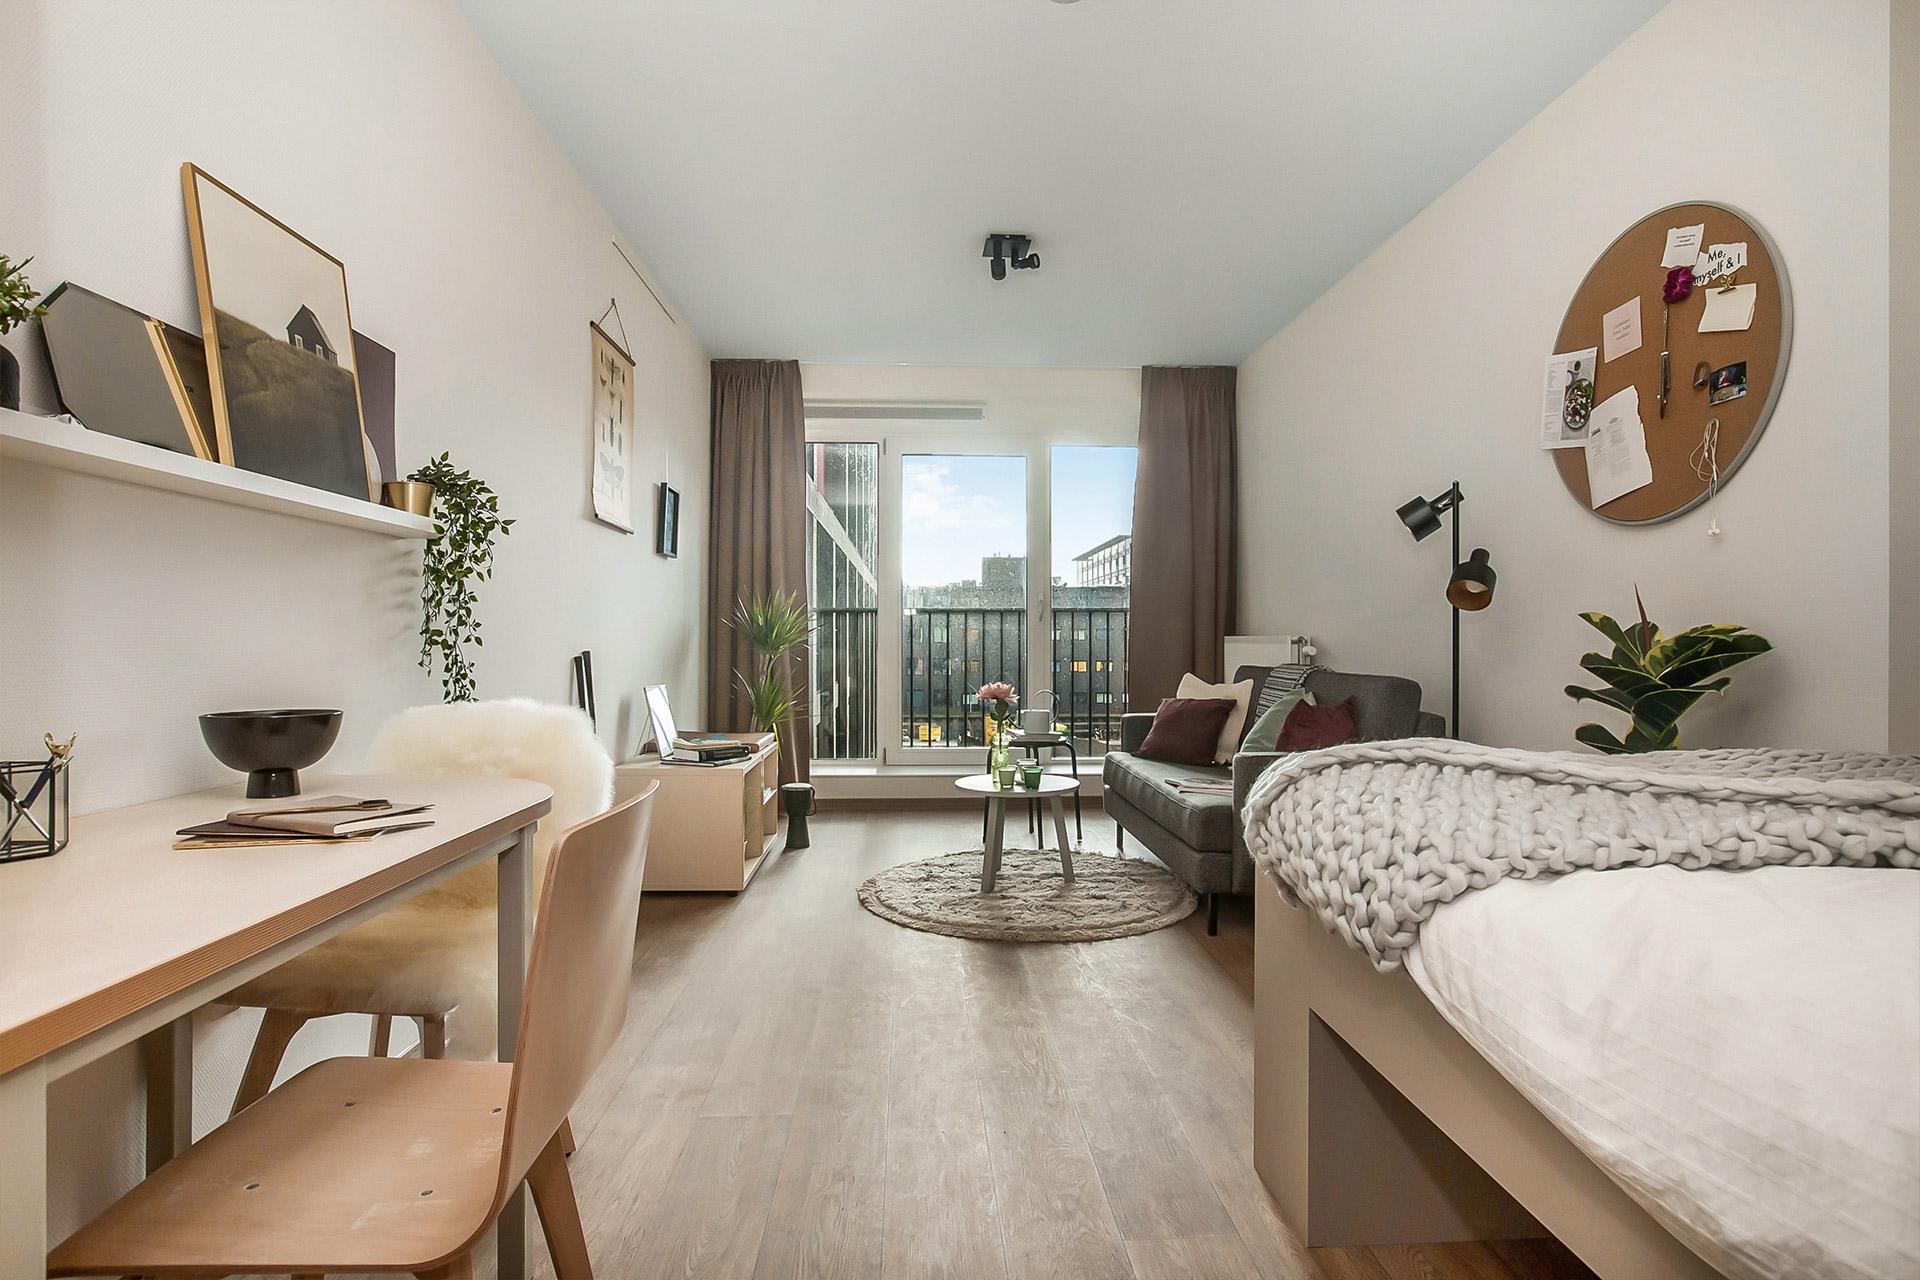 OurDomain Amsterdam South East Executive Plus Studio interior design of the room